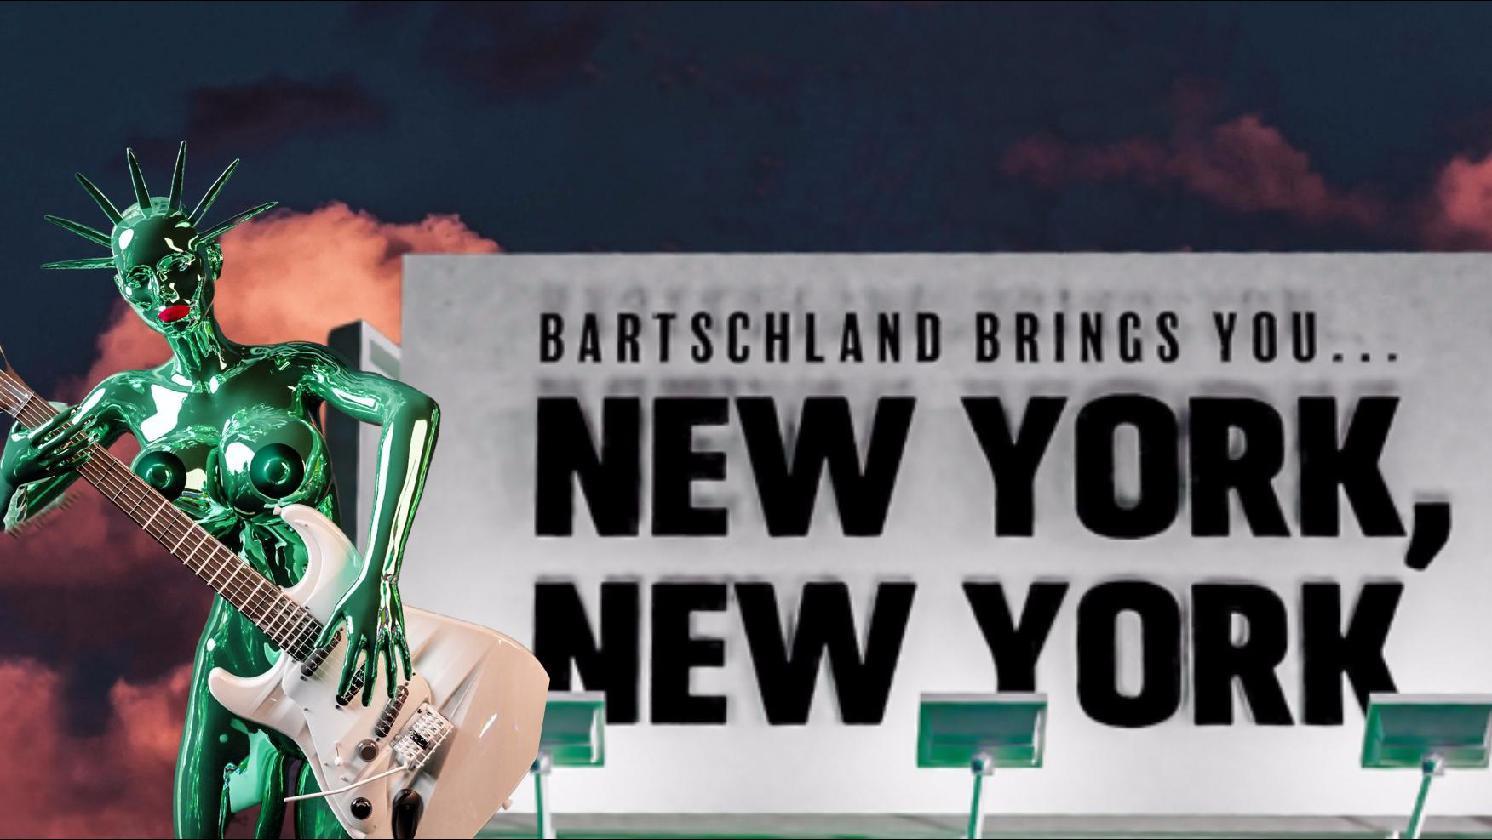 NEW YORK, NEW YORK! A Risqué Cabaret